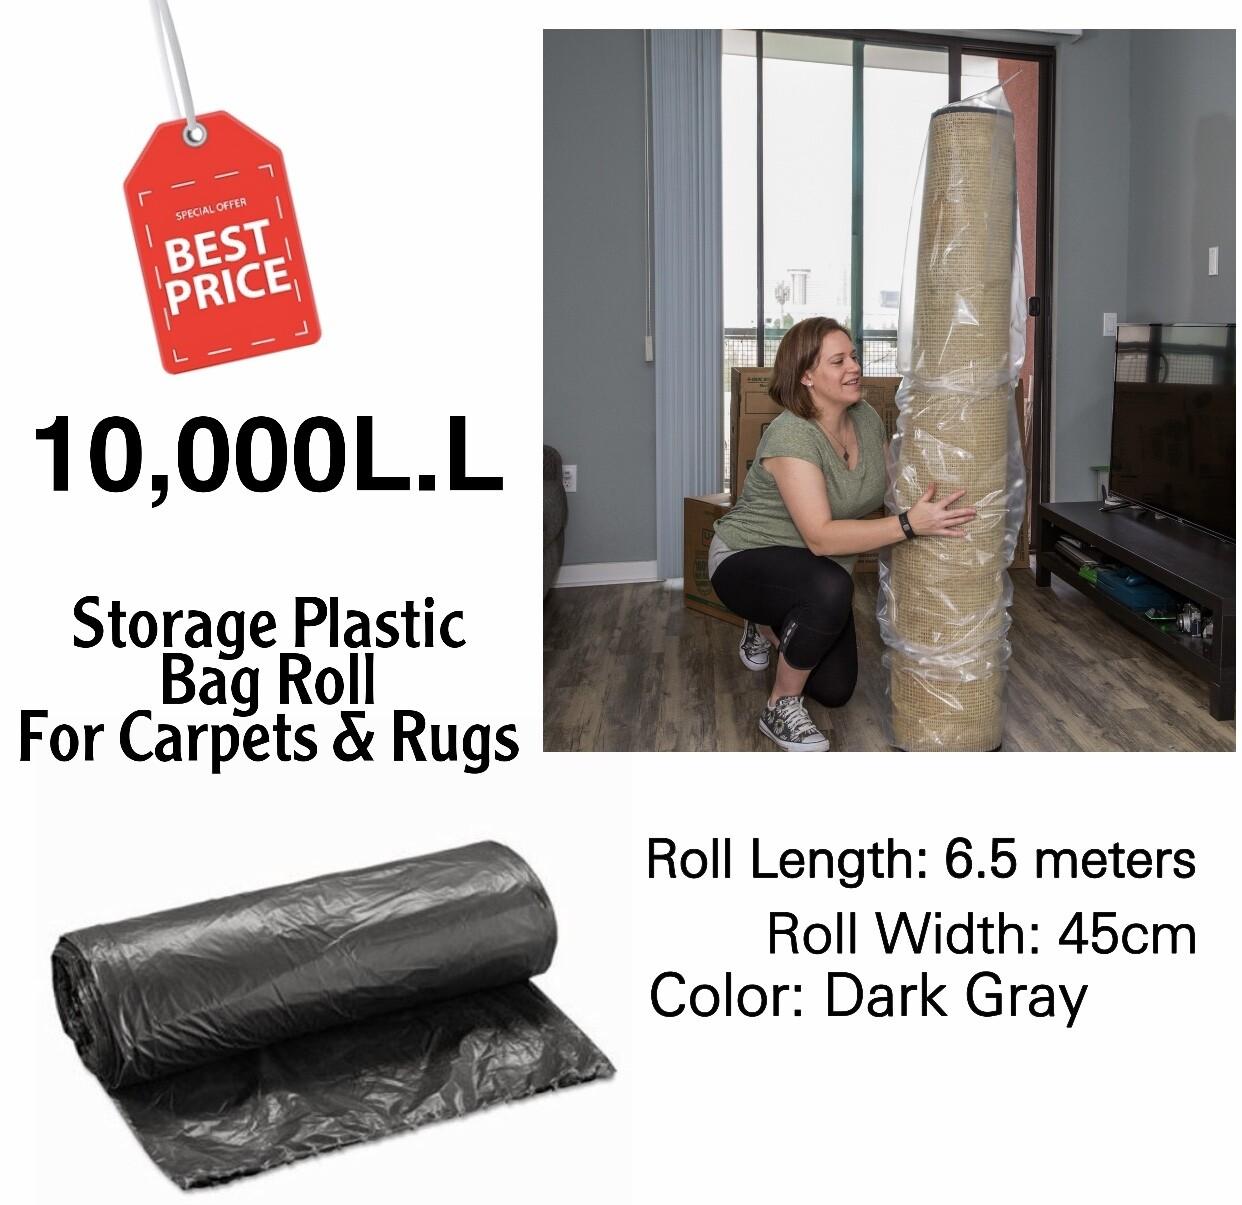 Carpets Storage Bag Roll